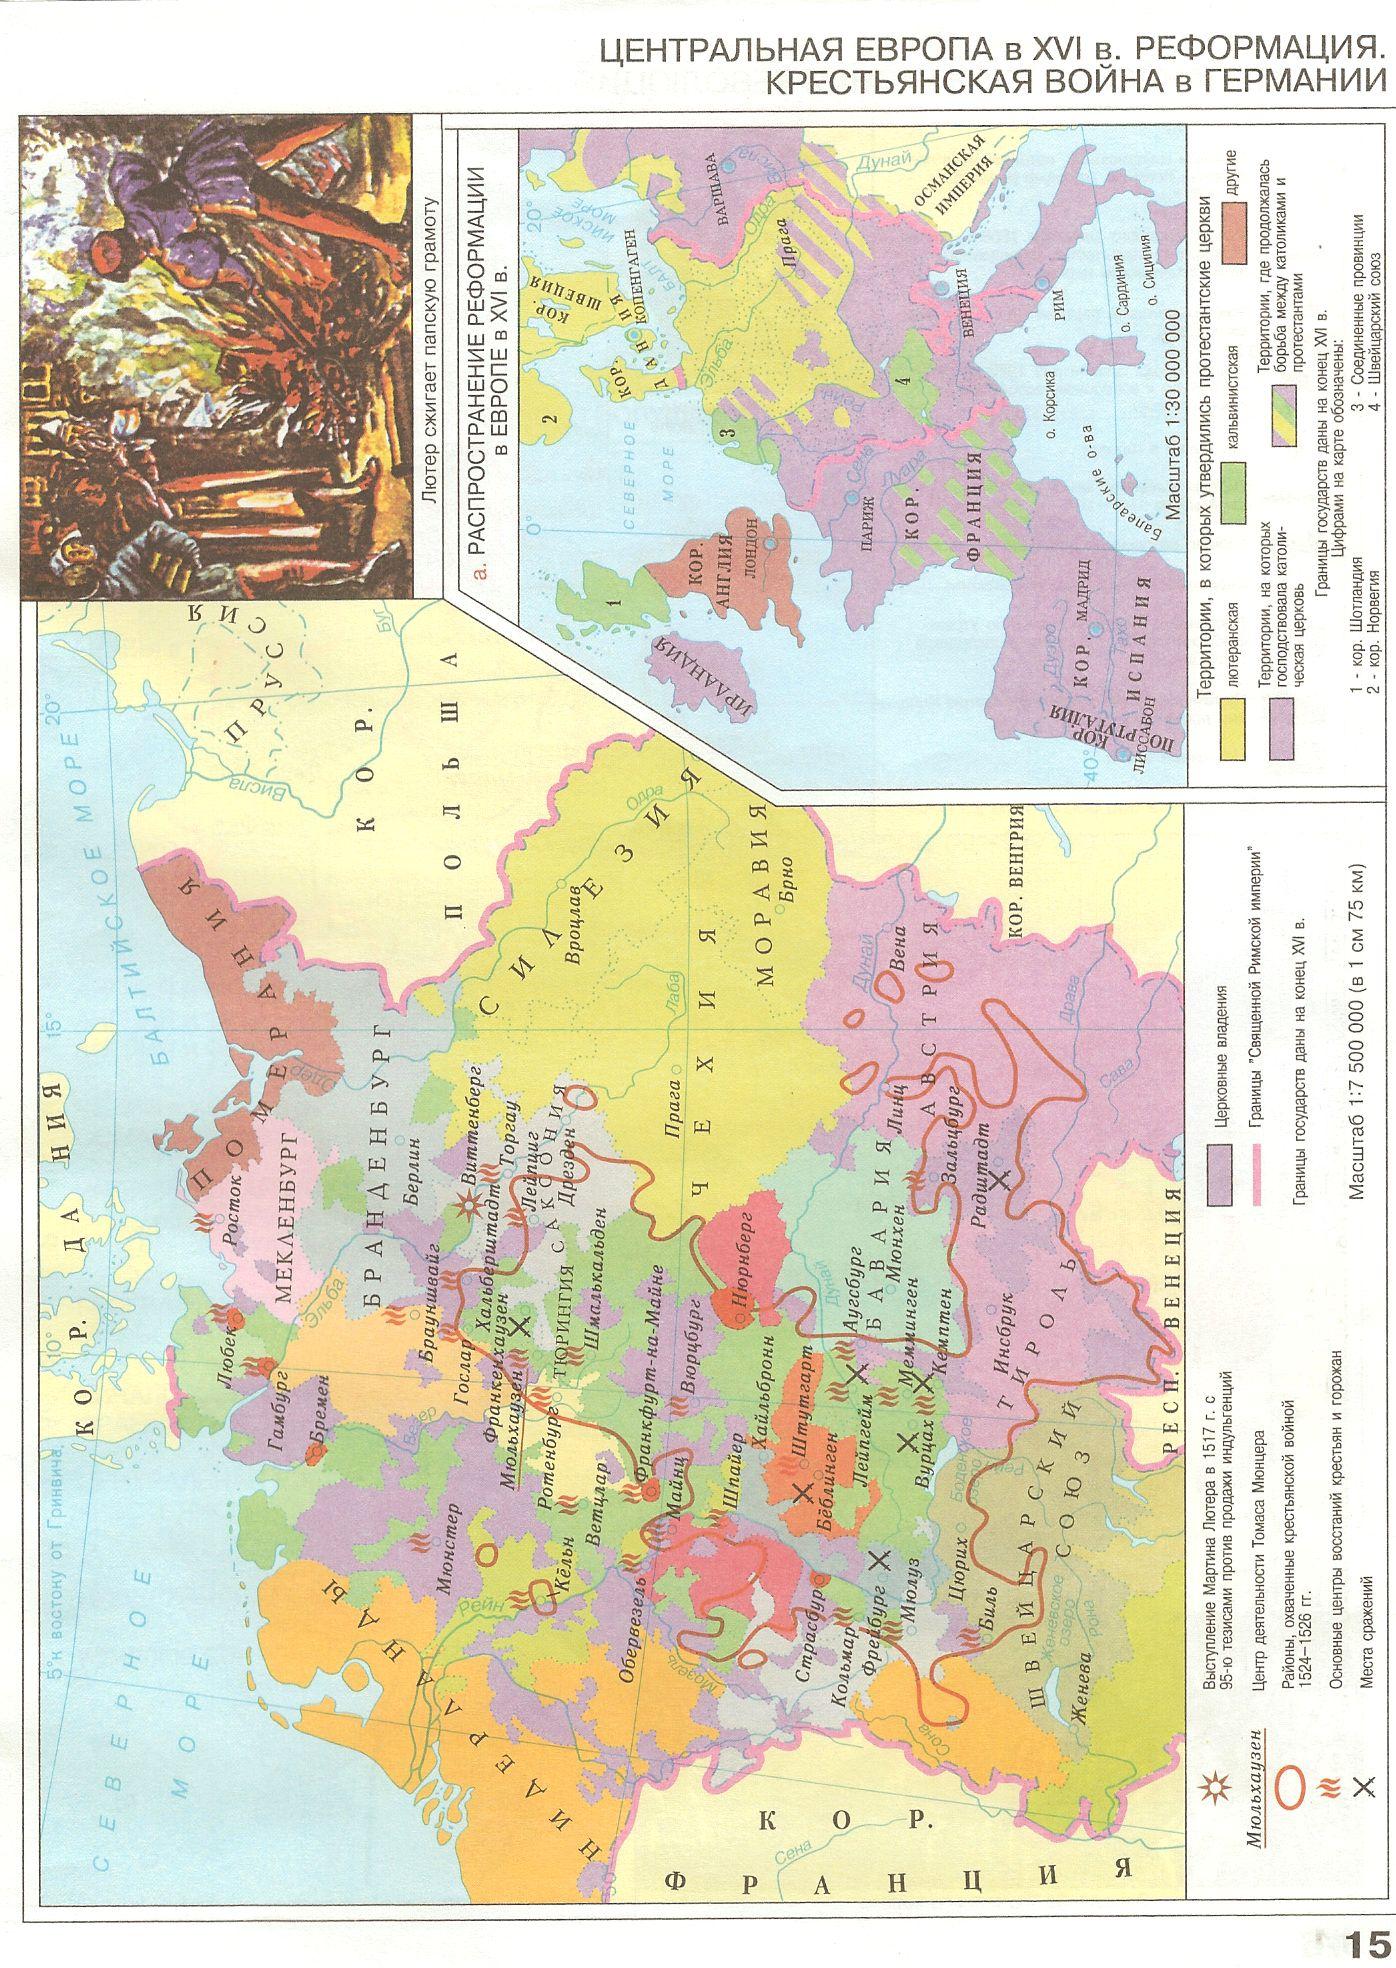 Центральная европа в xvi веке